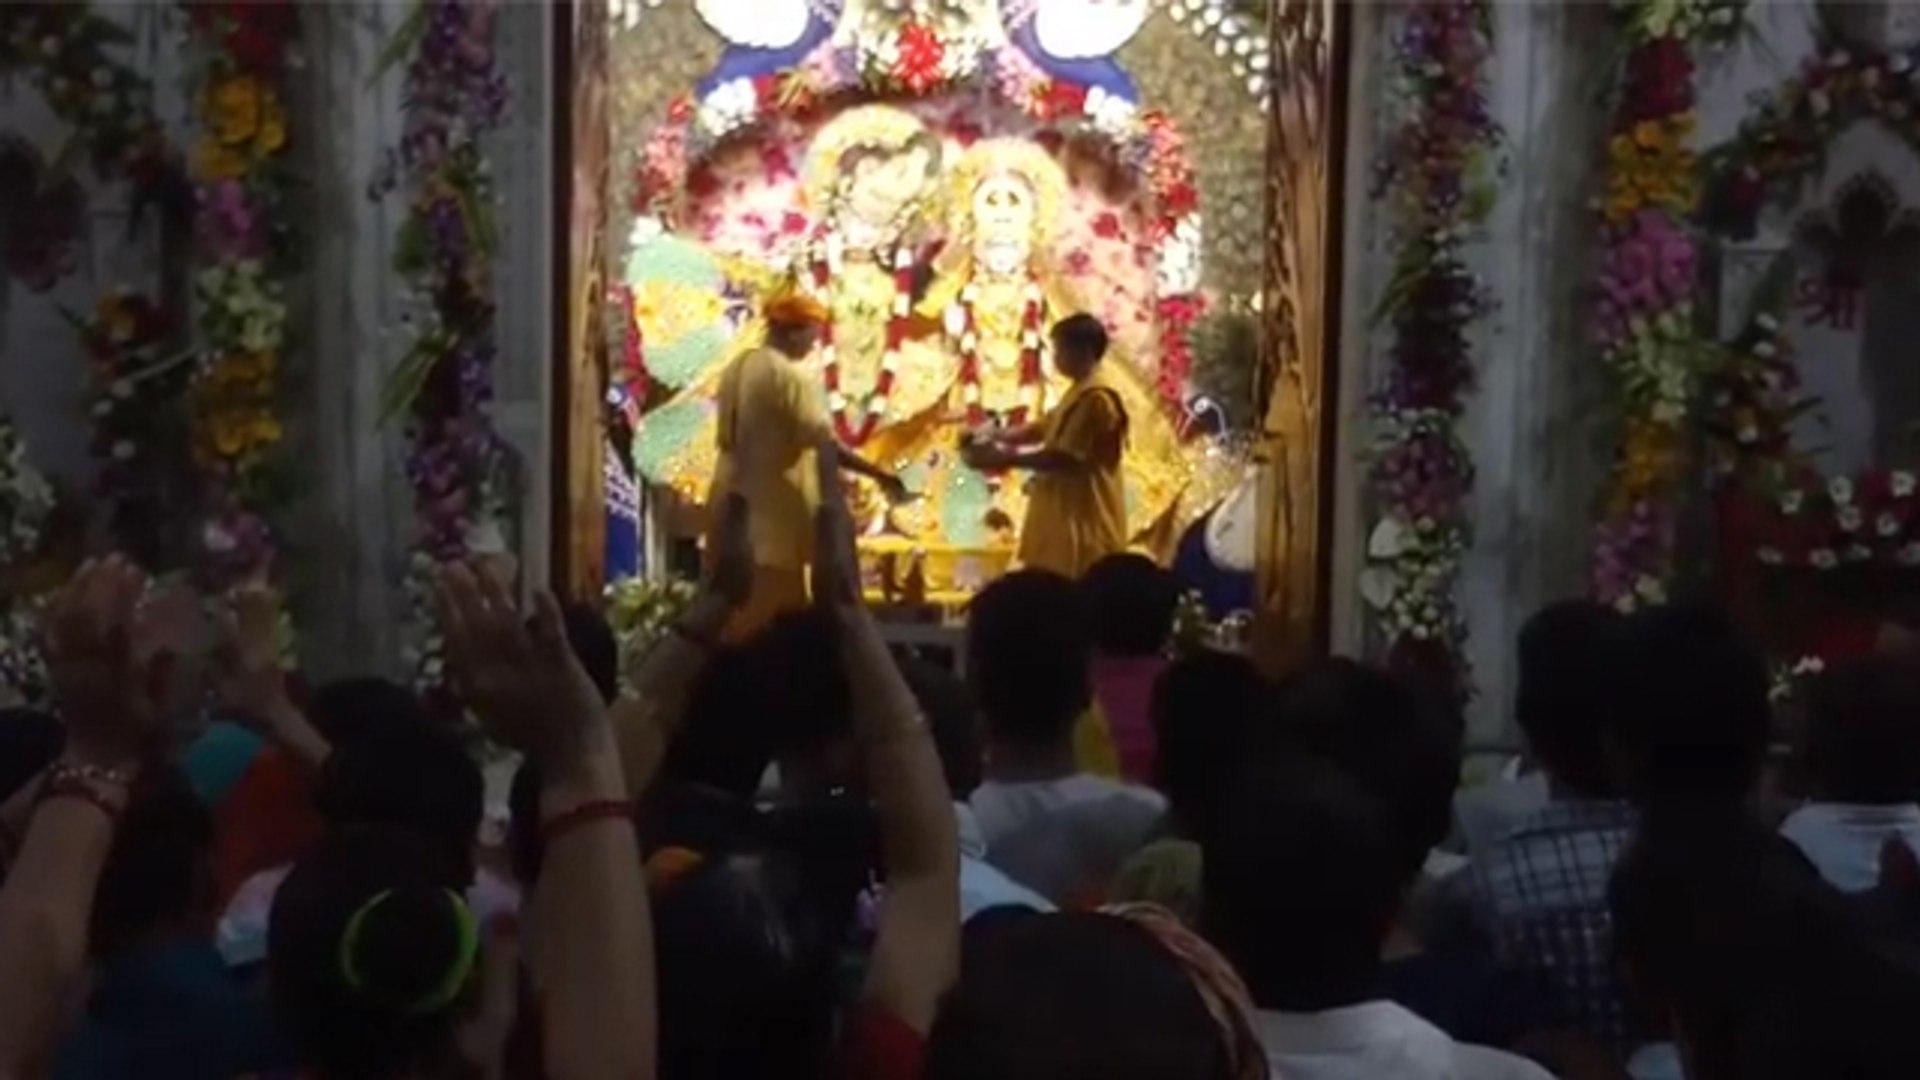 Janmashtami 2021: Mathura Janmotsav 2021 VIDEO | मथुरा श्रीकृष्ण जन्मोत्सव 2021| Boldsky